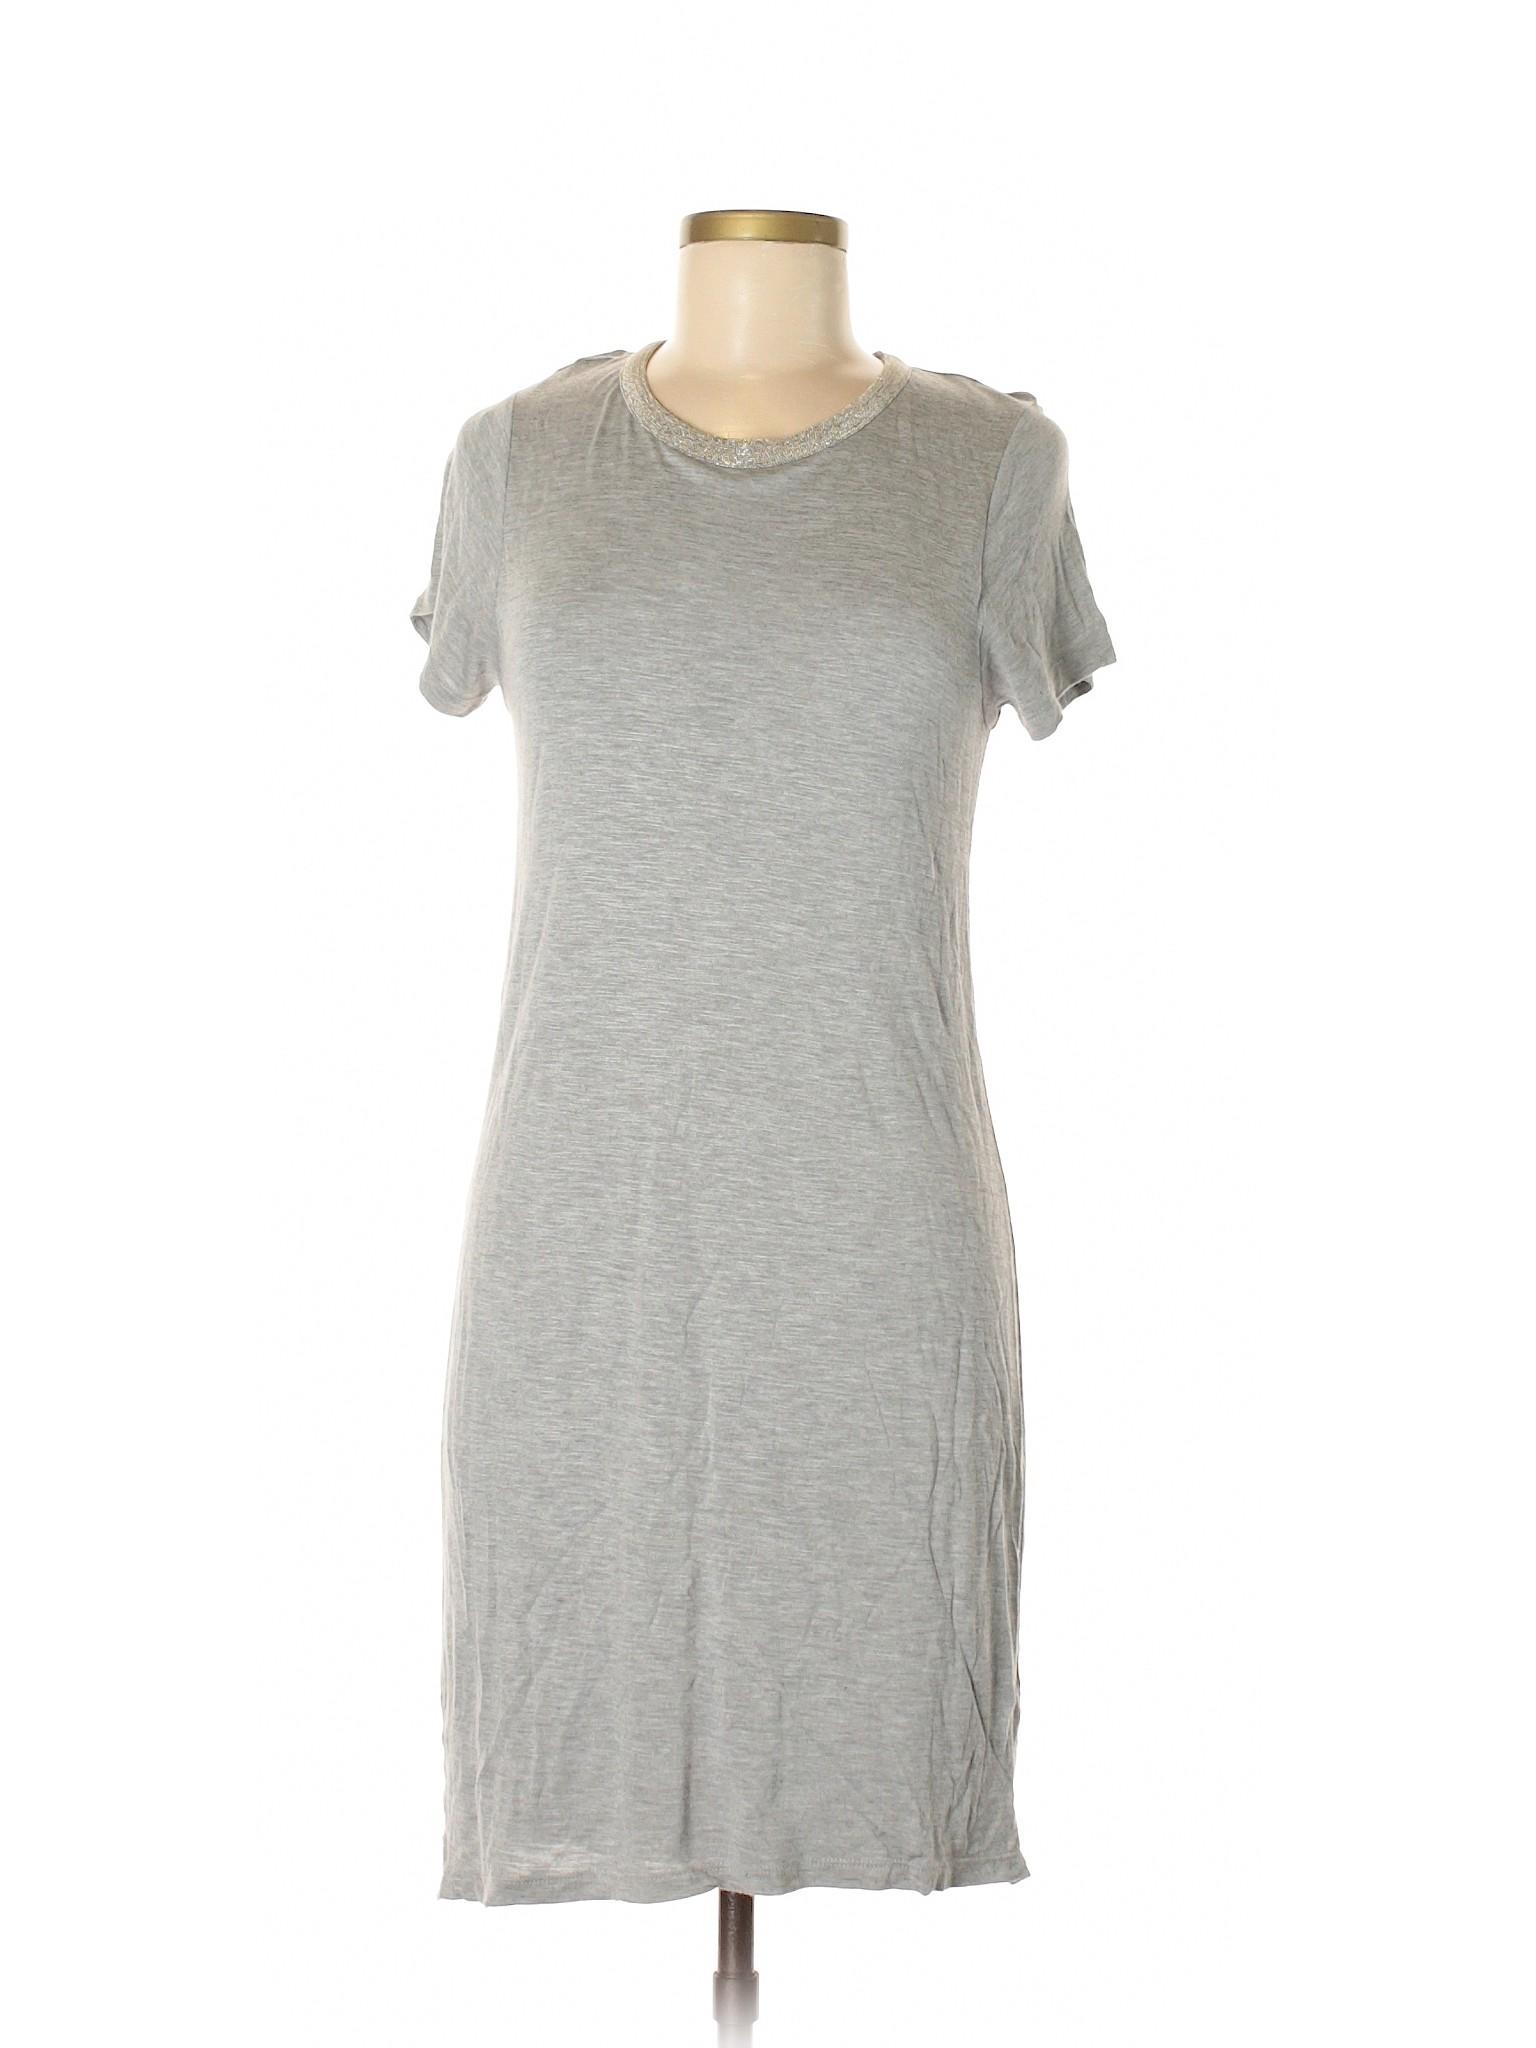 Dress Selling dalia Selling dalia Selling Casual dalia dalia Casual Selling Casual Dress Dress fAxqAwp